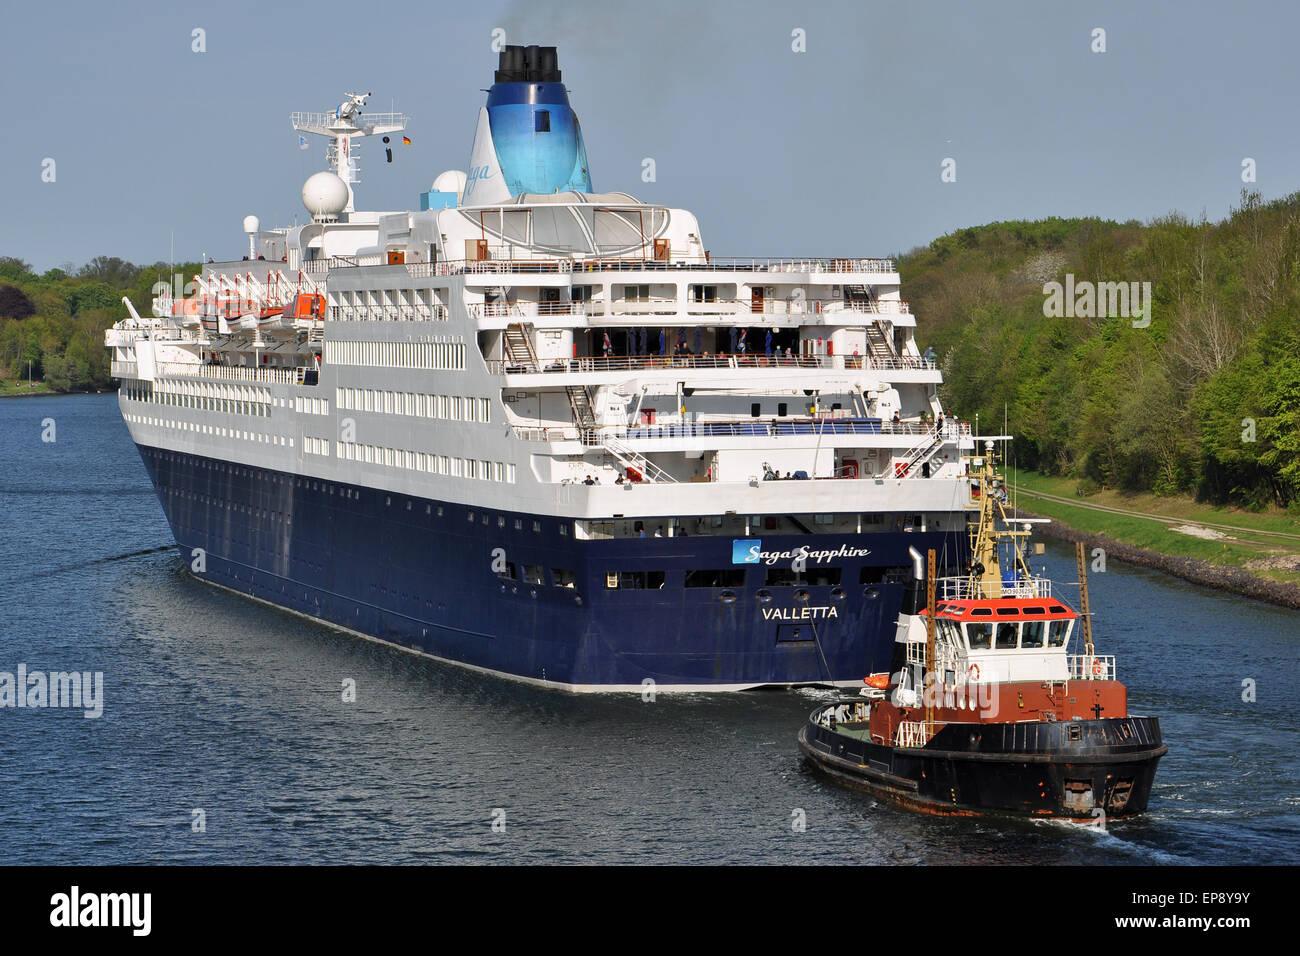 Cruiseship Saga Sapphire passing the Kiel Canal assisted by local tugboat Wal - Stock Image